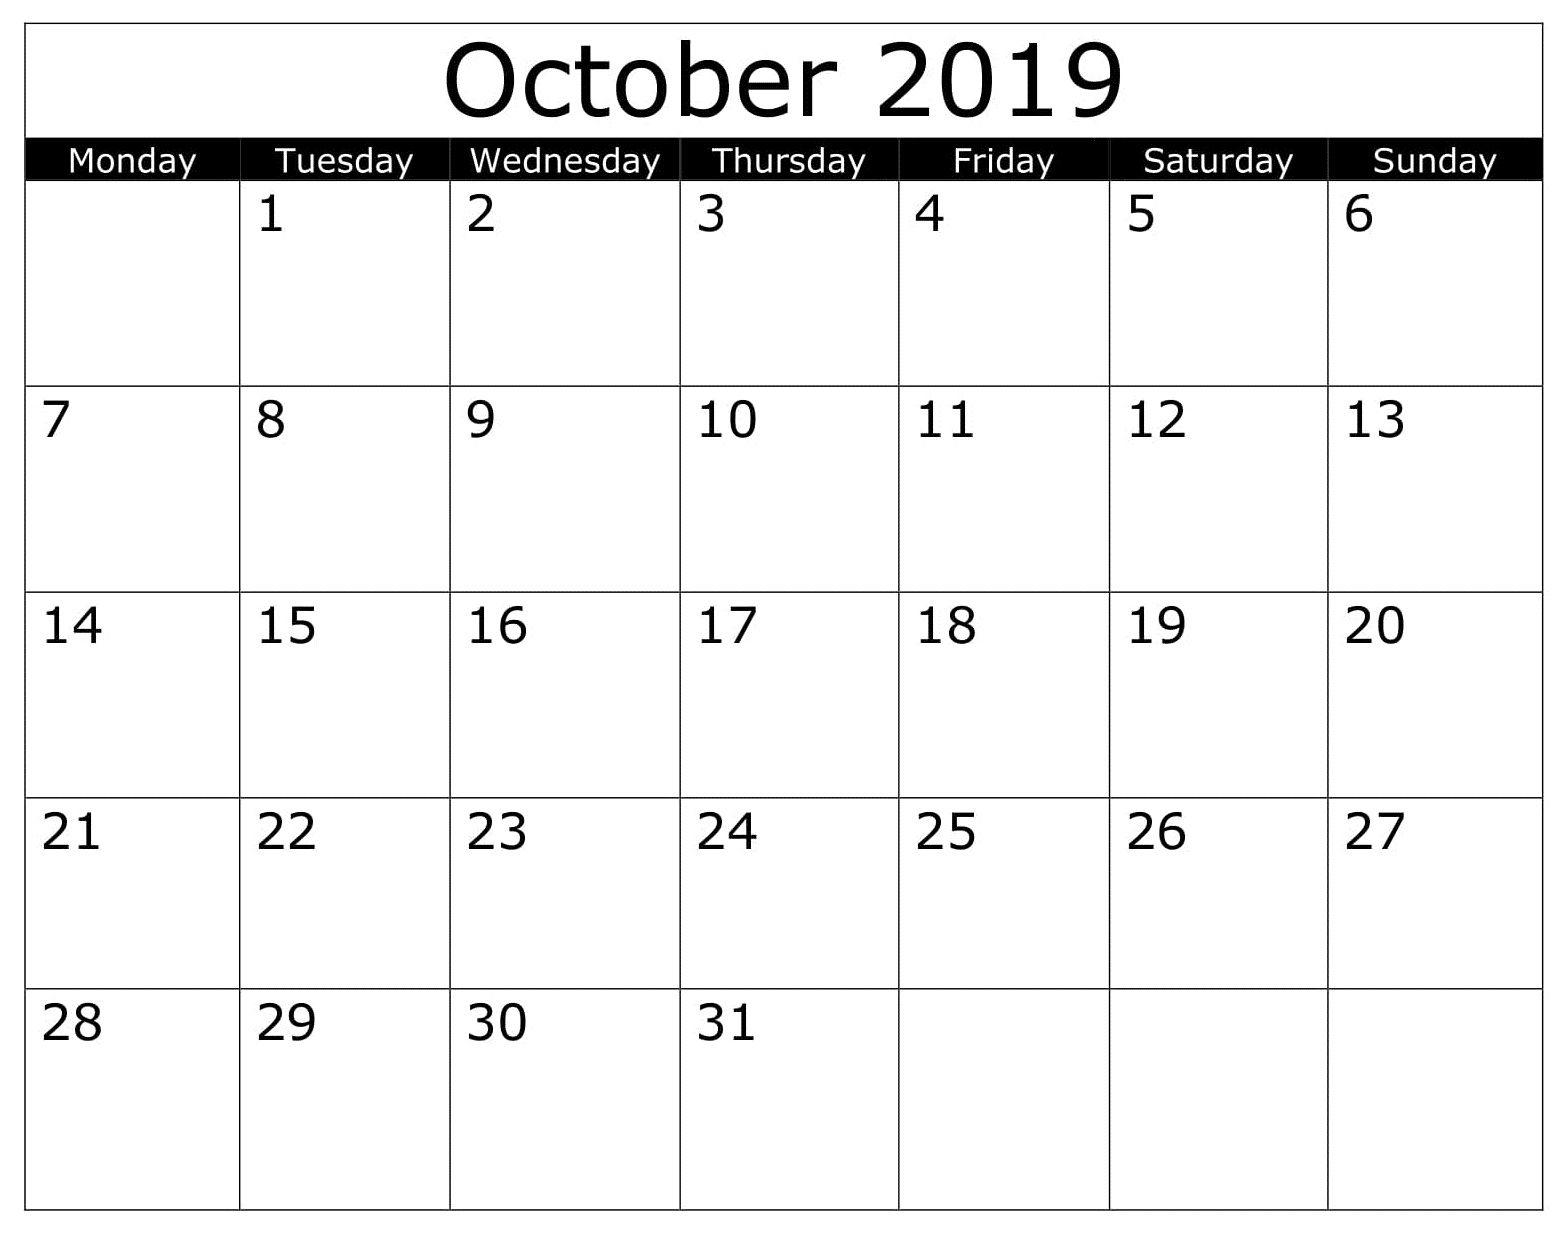 October Calendar 2019 Template Excel Calendar 2019 Template